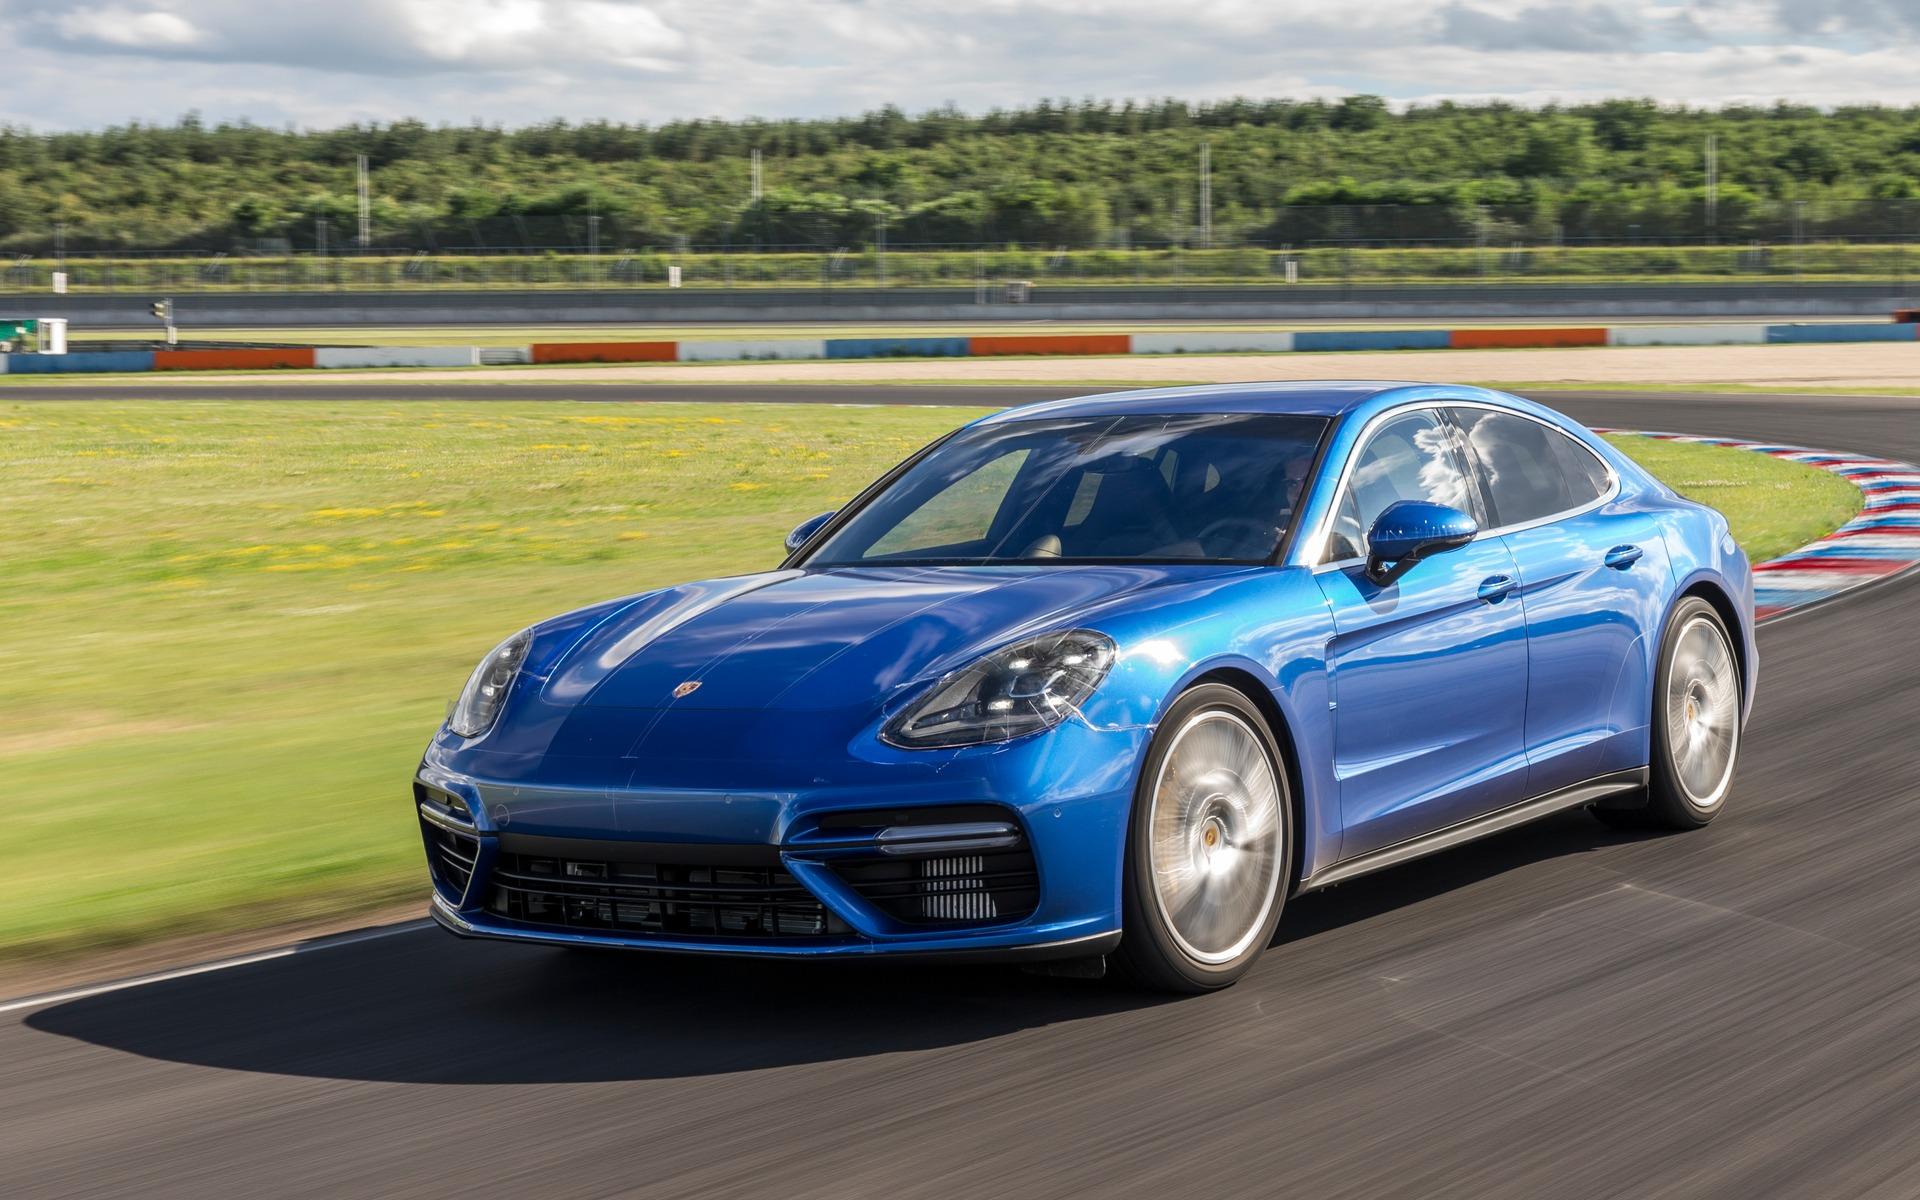 2017 porsche panamera technological marvel the car guide - Porsche panamera 5 portes ...